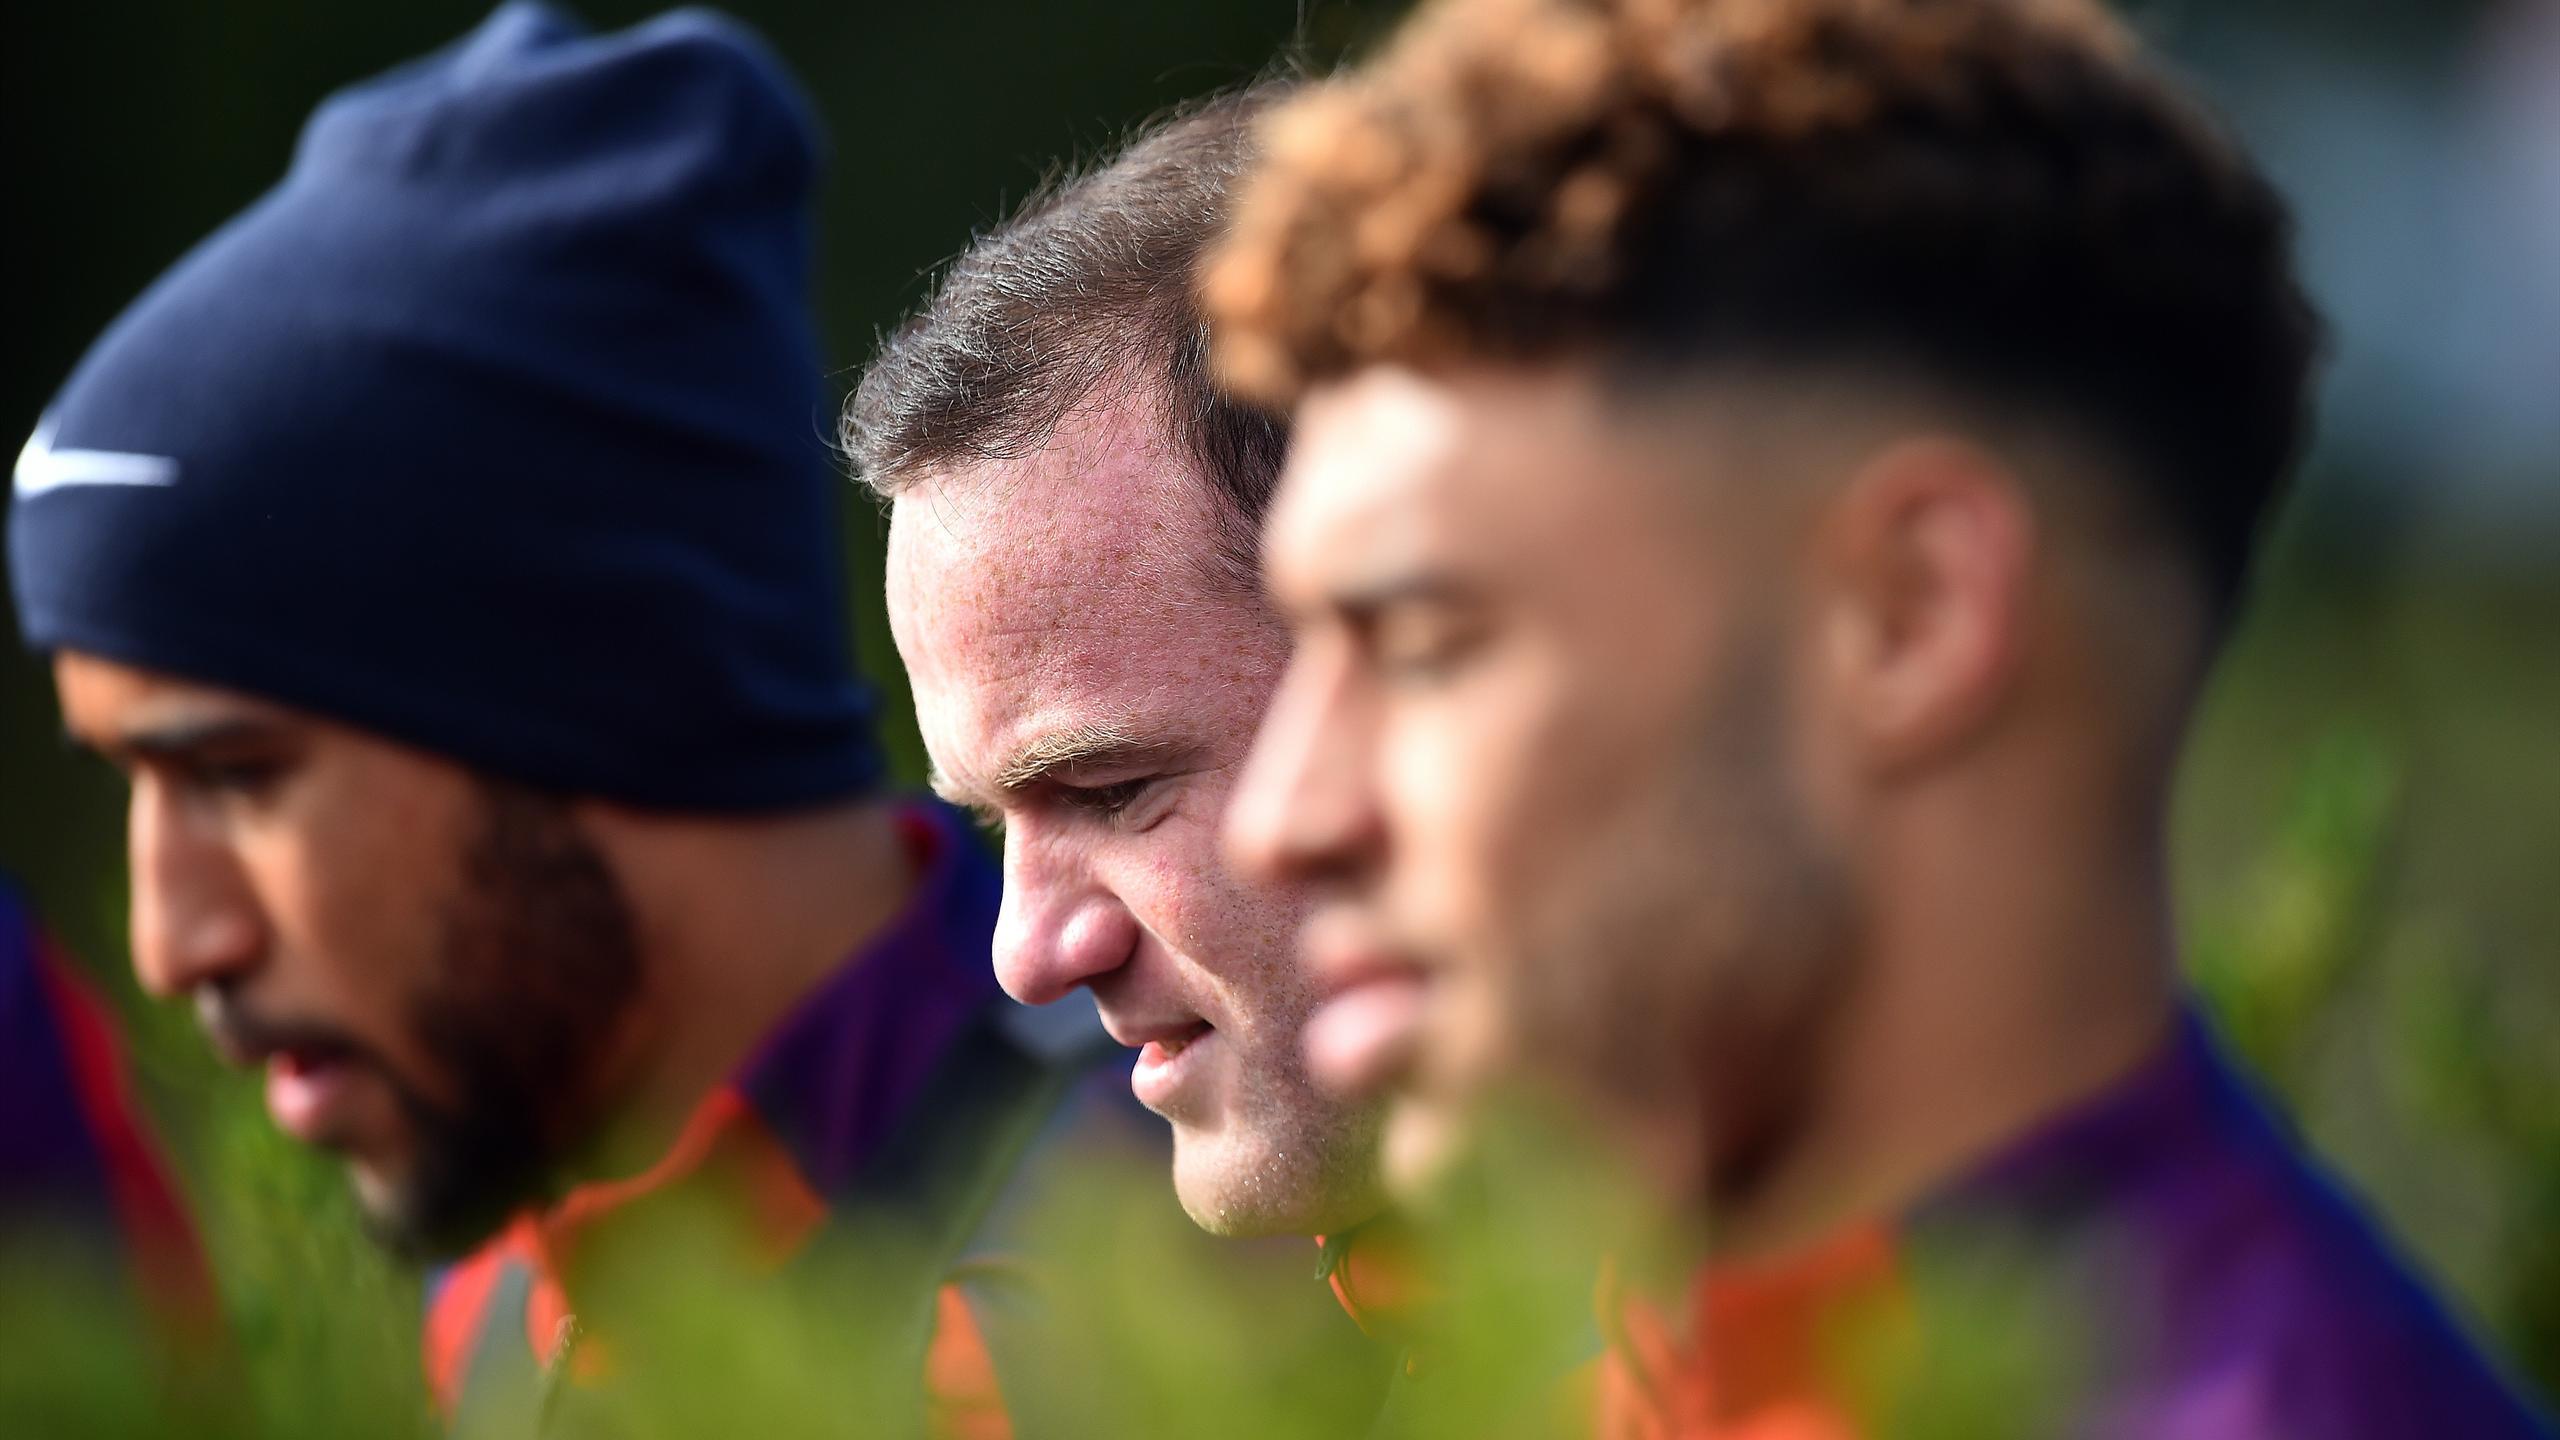 England's striker Wayne Rooney (C) attends a team training at Tottenham Hotspur's football training facility in Enfield